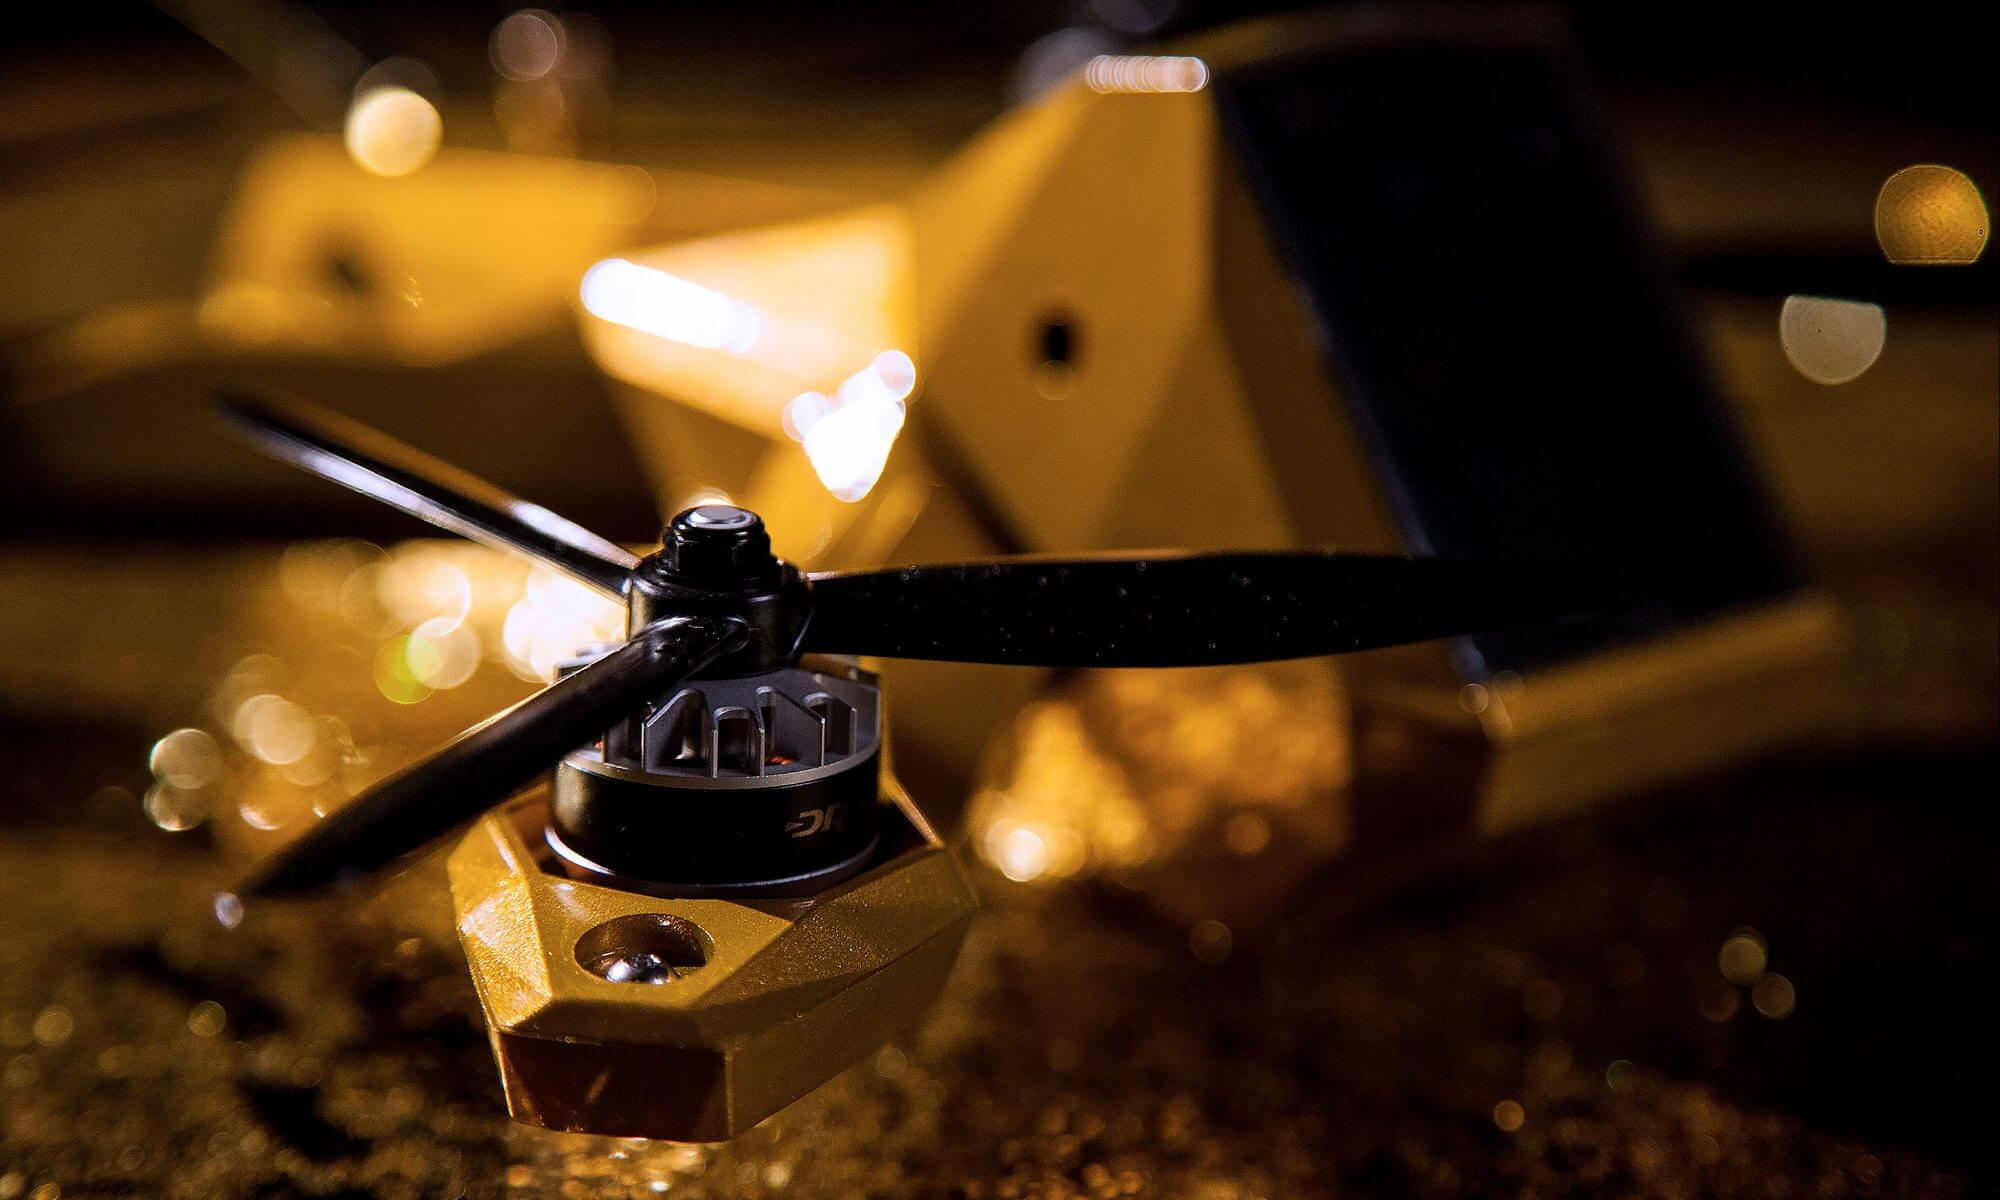 DRL Drone Drohne Racing Racingdrone Racingdrohne Quad Quadrocopter FPV FPVRacingDrone